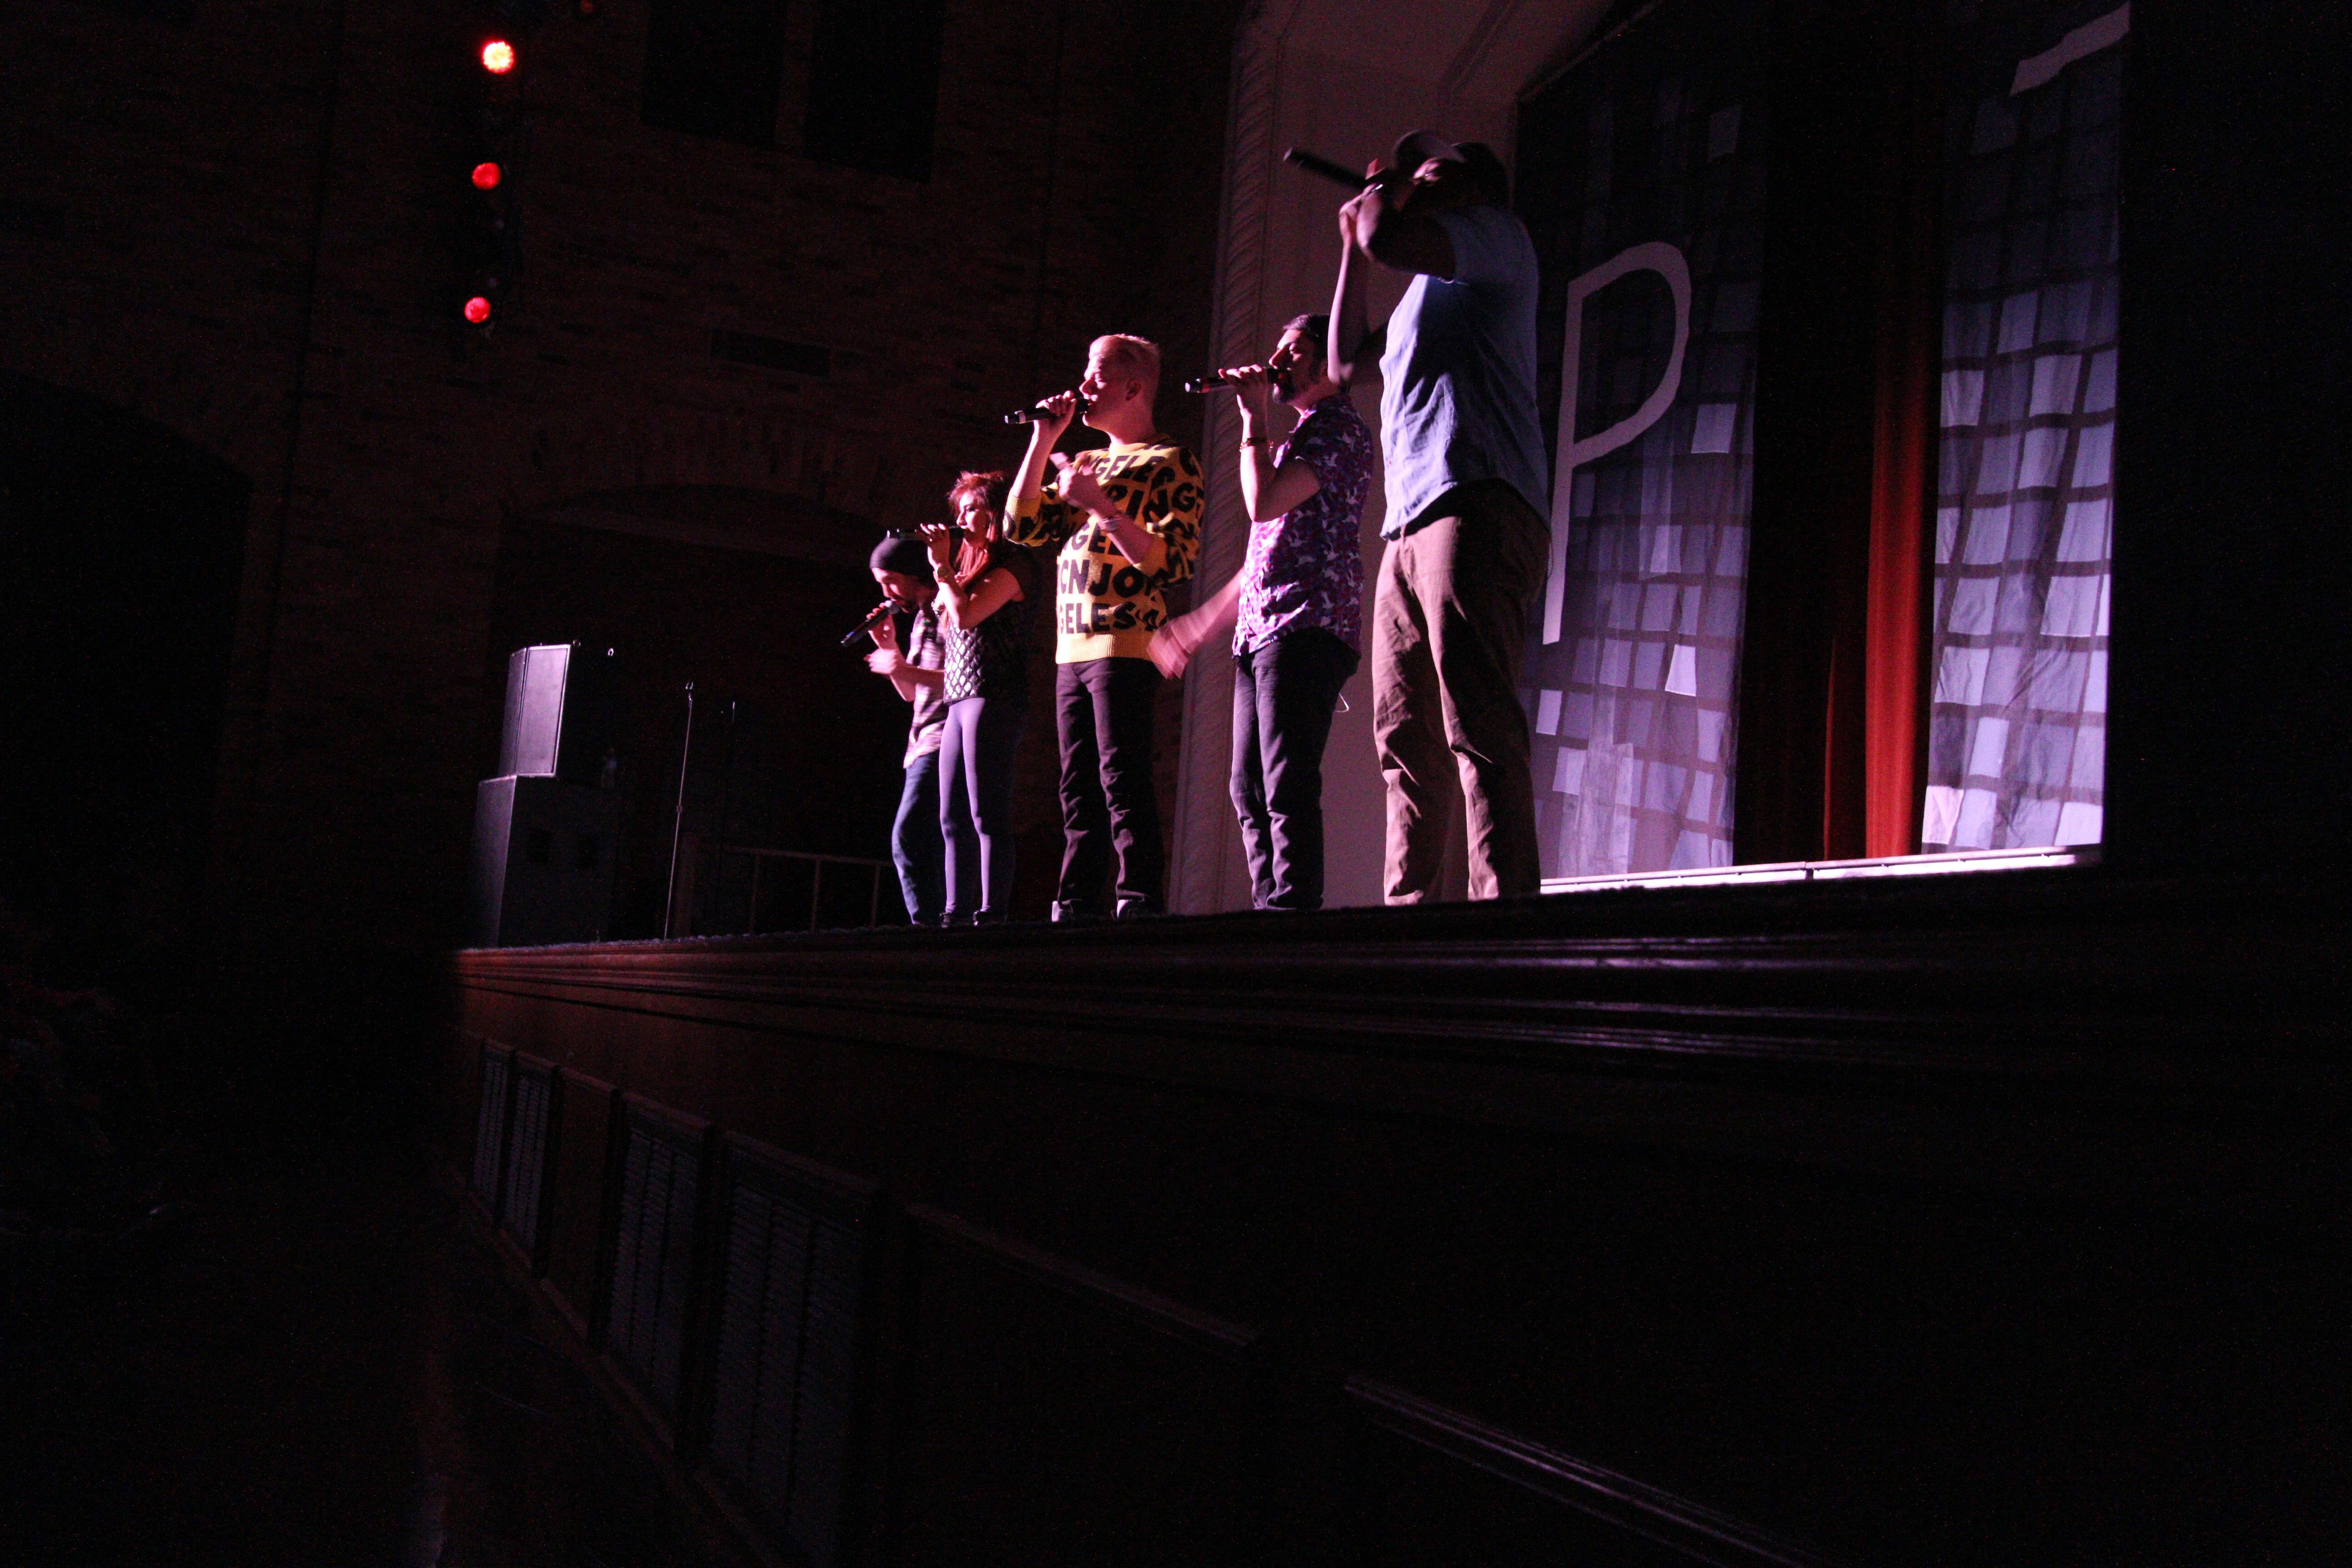 Pentatonix delivers anticipated performance